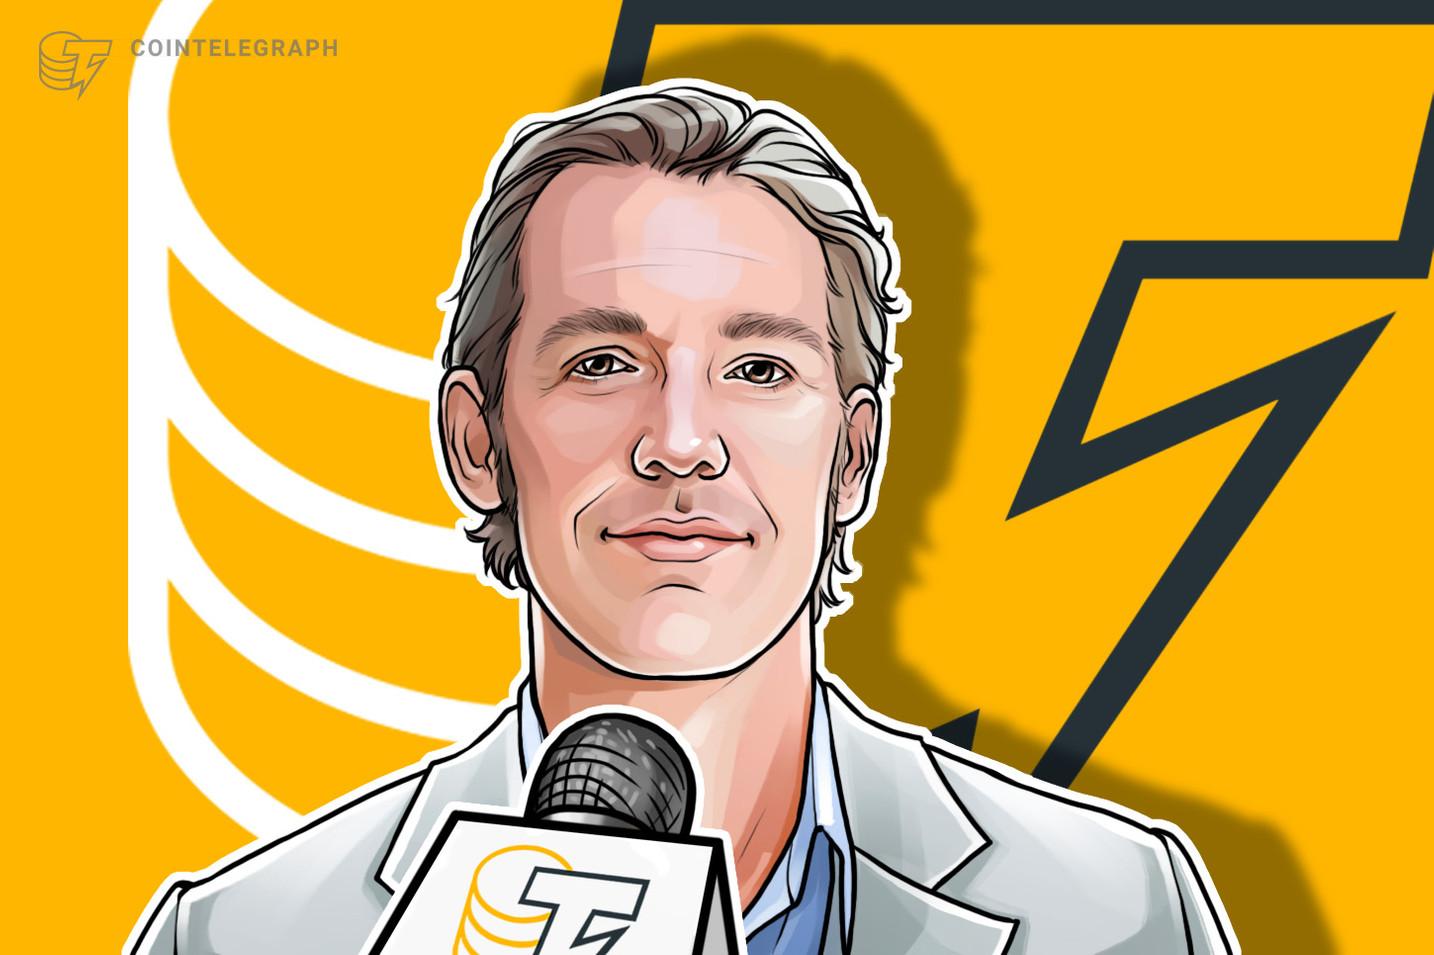 "CEO de Uphold: ""Veo un enorme potencial de Bitcoin y las criptomonedas para Latinoamérica"""